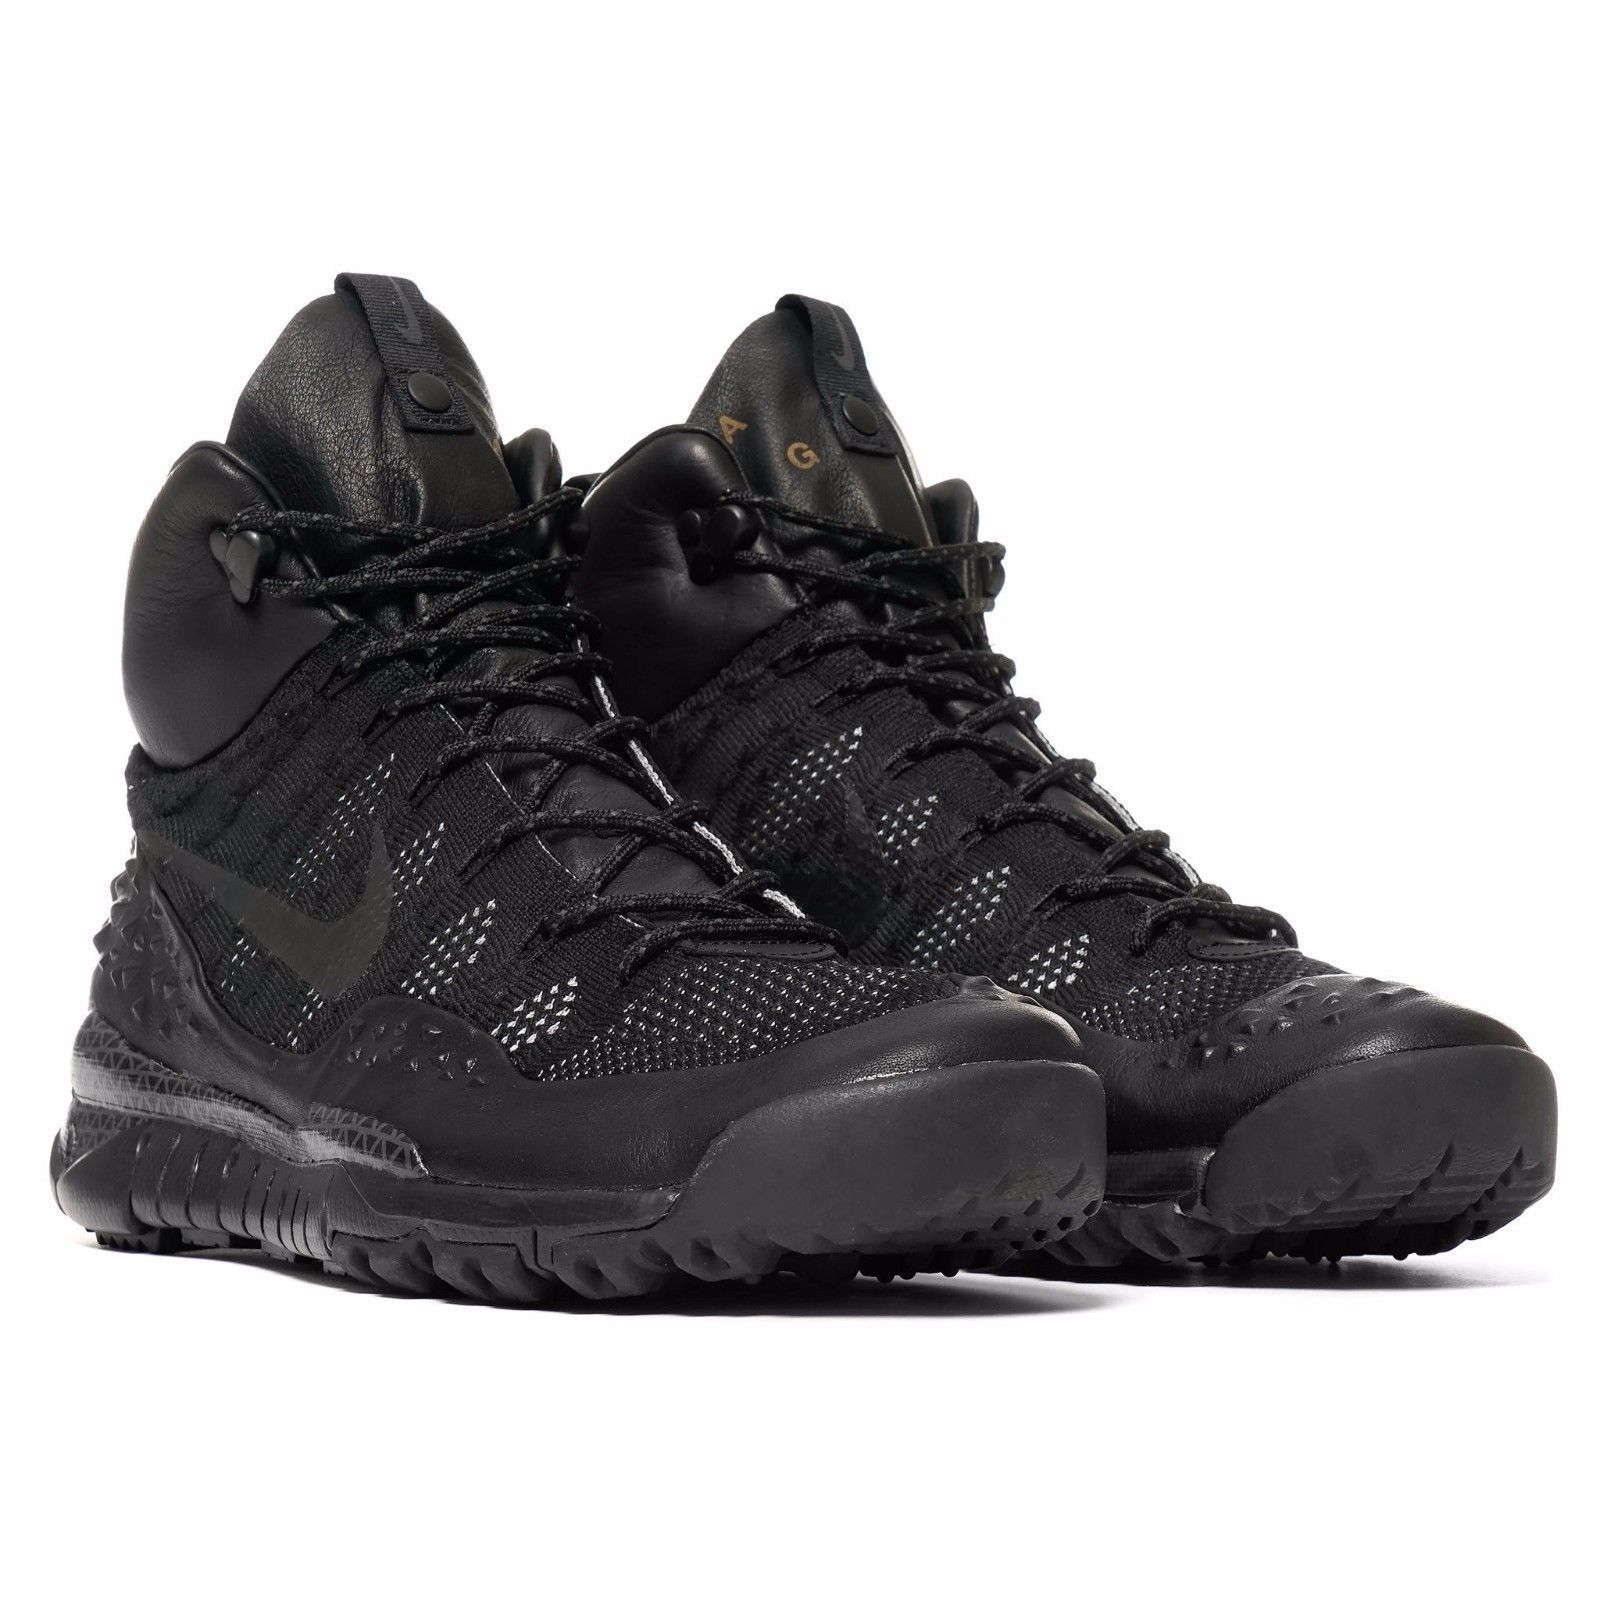 Brand New Mens Nike Lupinek Flyknit ACG 826077-001 Black/Anthracite Szs  10.5-